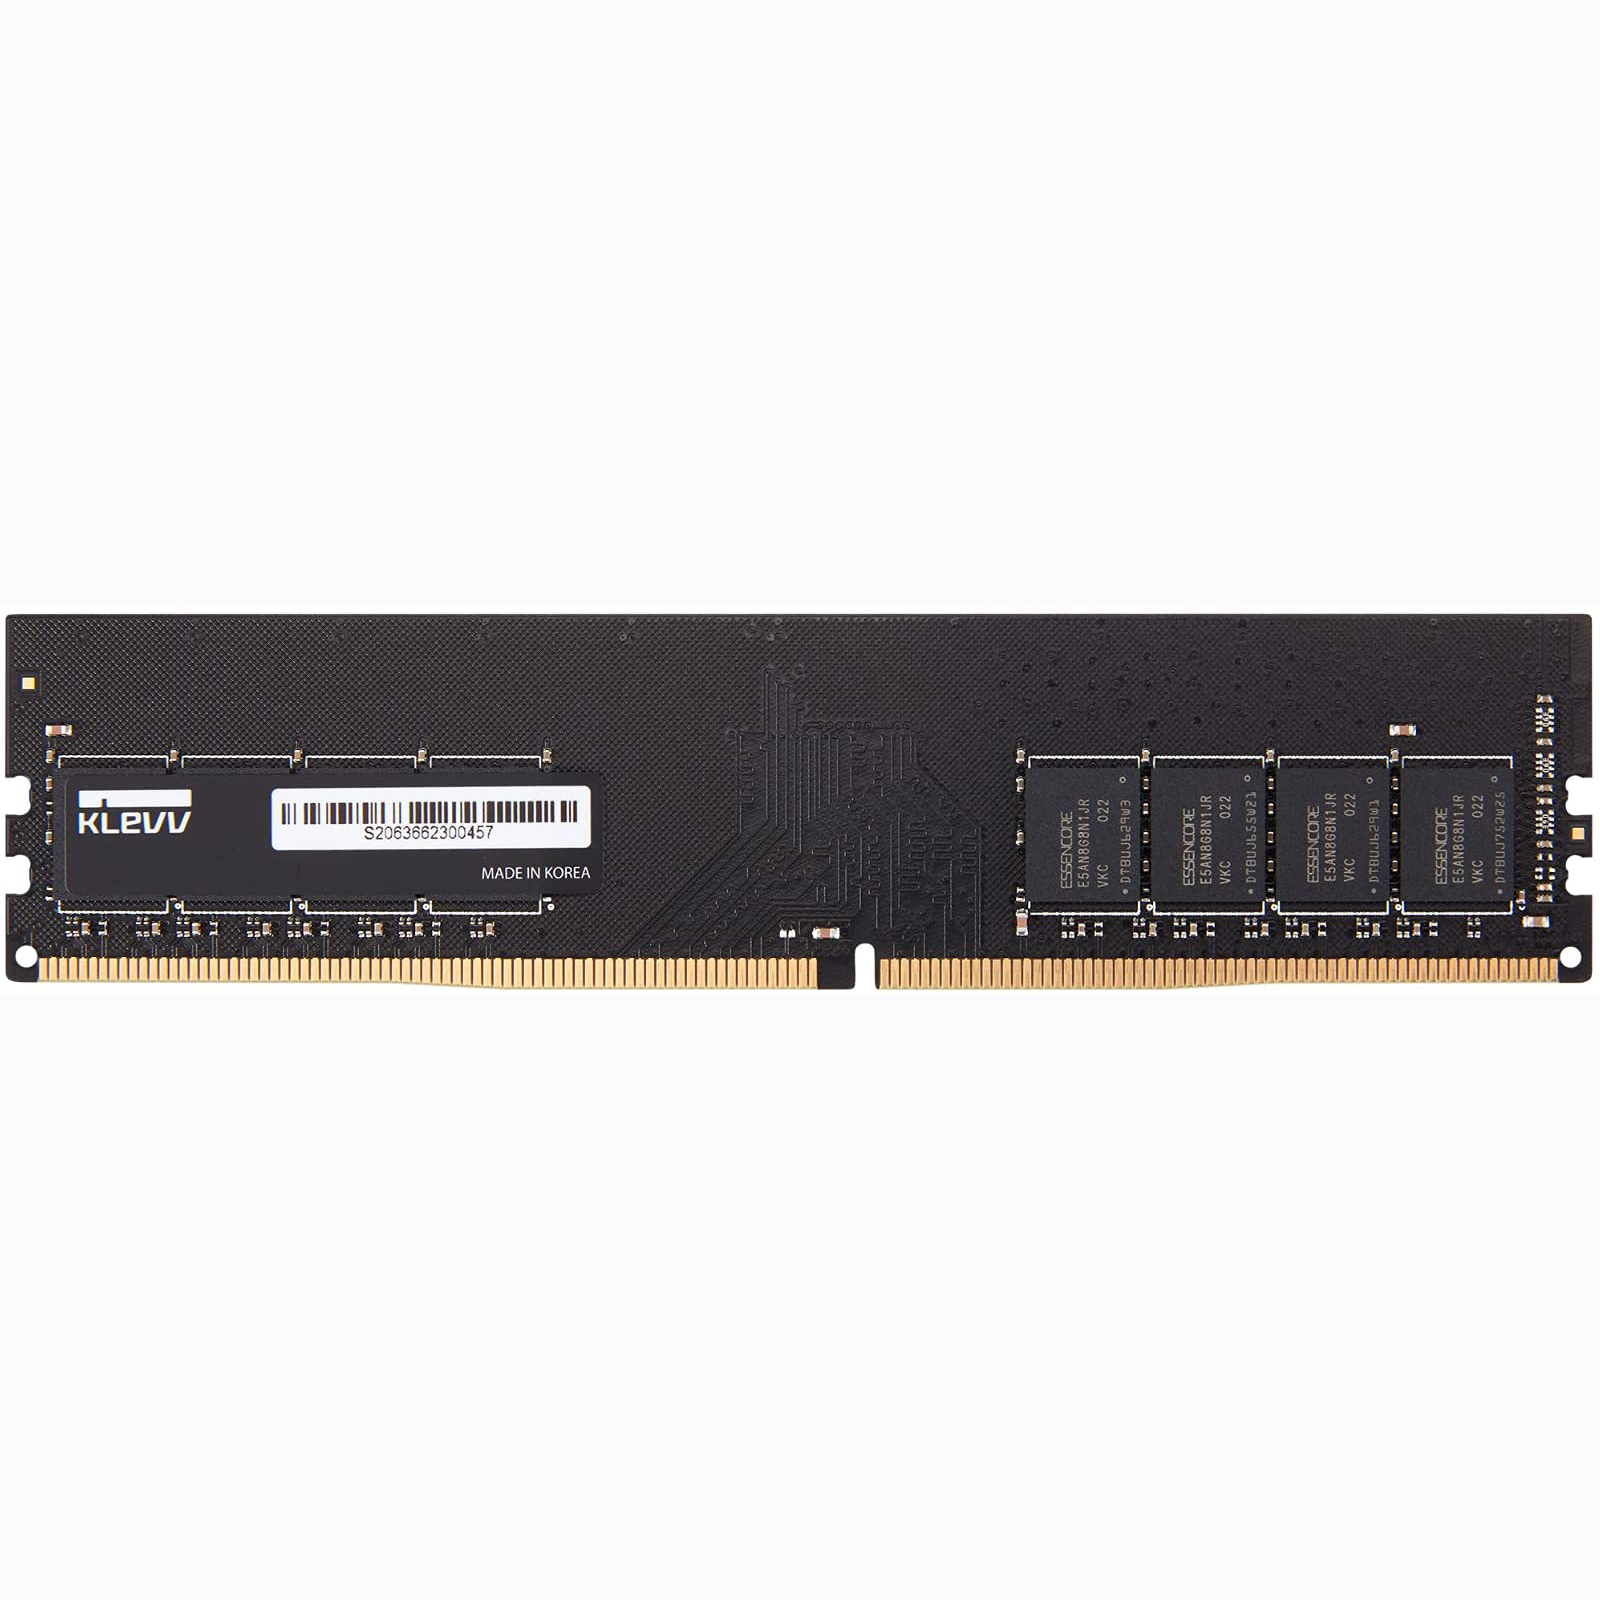 DDR4 8GB PC2666 KLEVV FOR PC 288 PIN UNBUFFERED DIMM  19-19-19-43 ,Desktop RAM